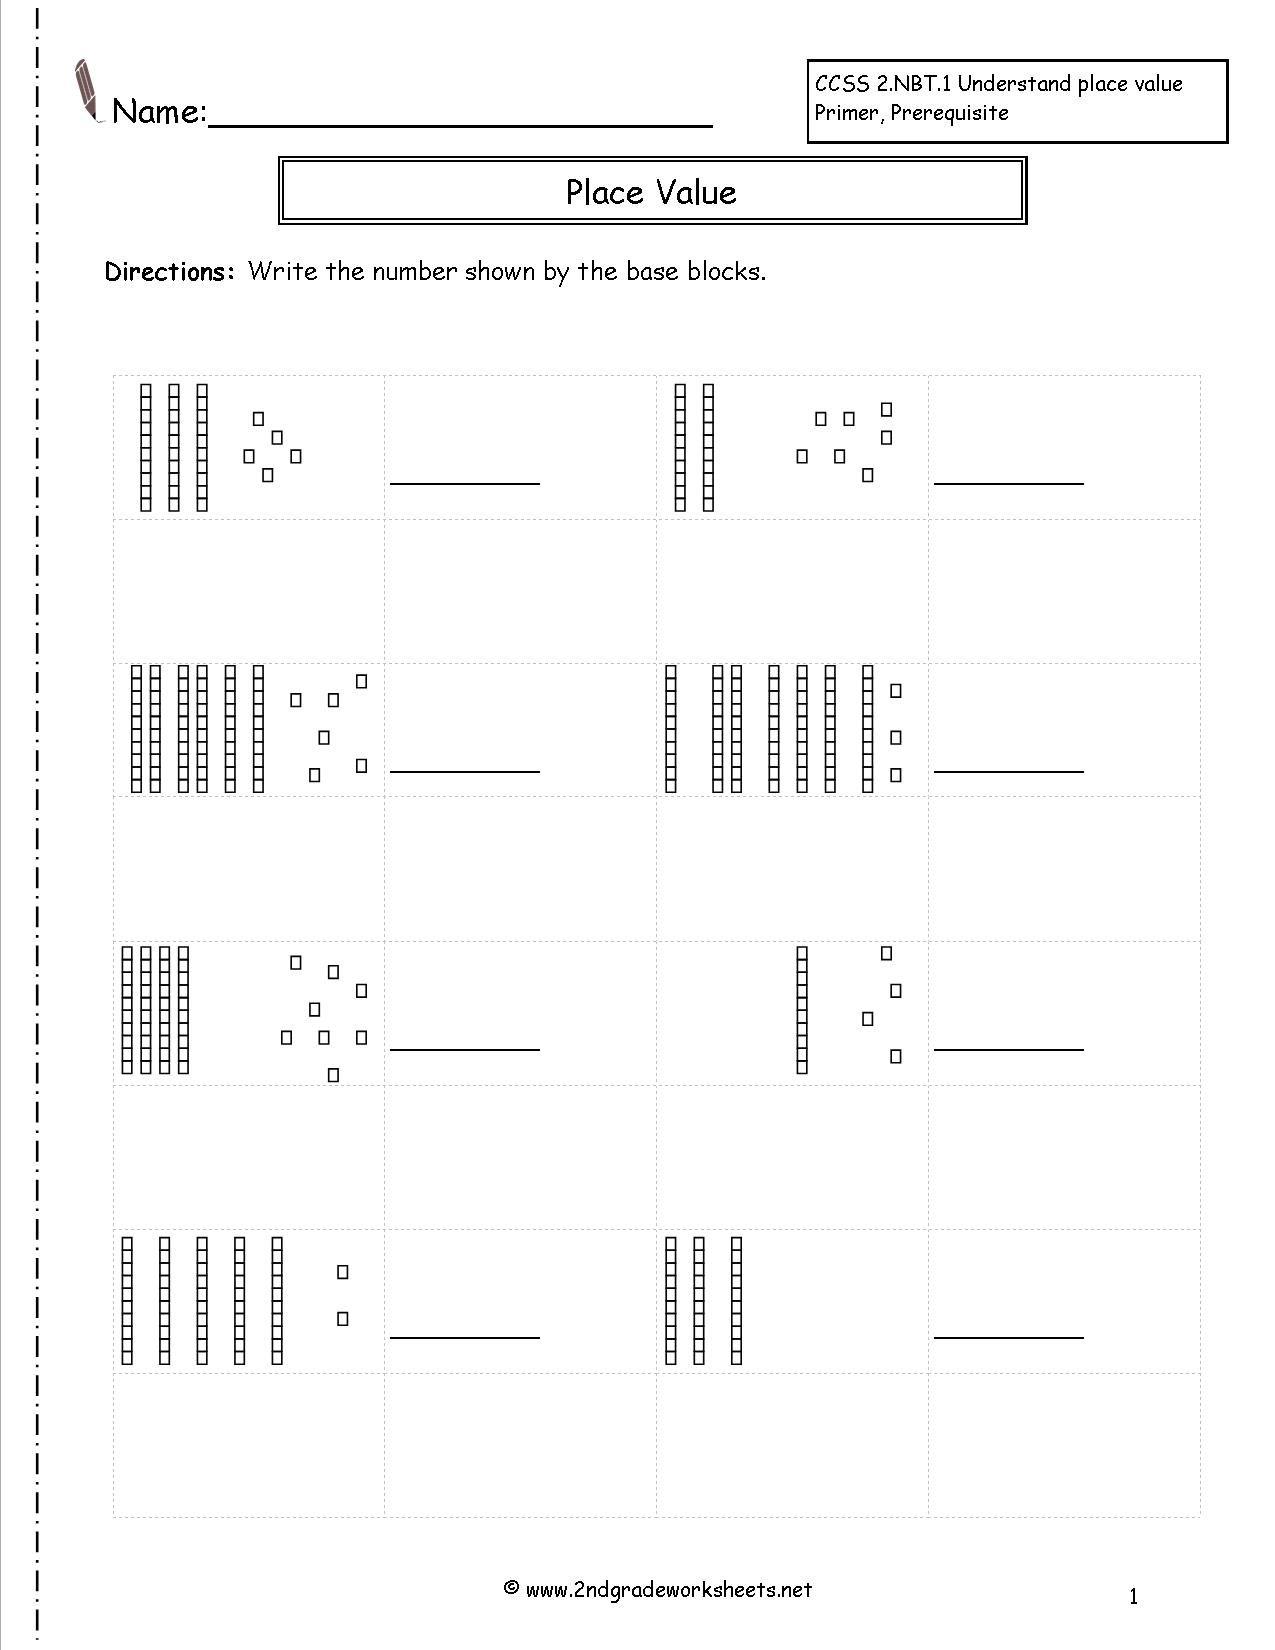 Predownload: Placevalue5 Jpg 1275 1650 Place Value Worksheets Kindergarten Worksheets Kindergarten Worksheets Printable [ 1650 x 1275 Pixel ]